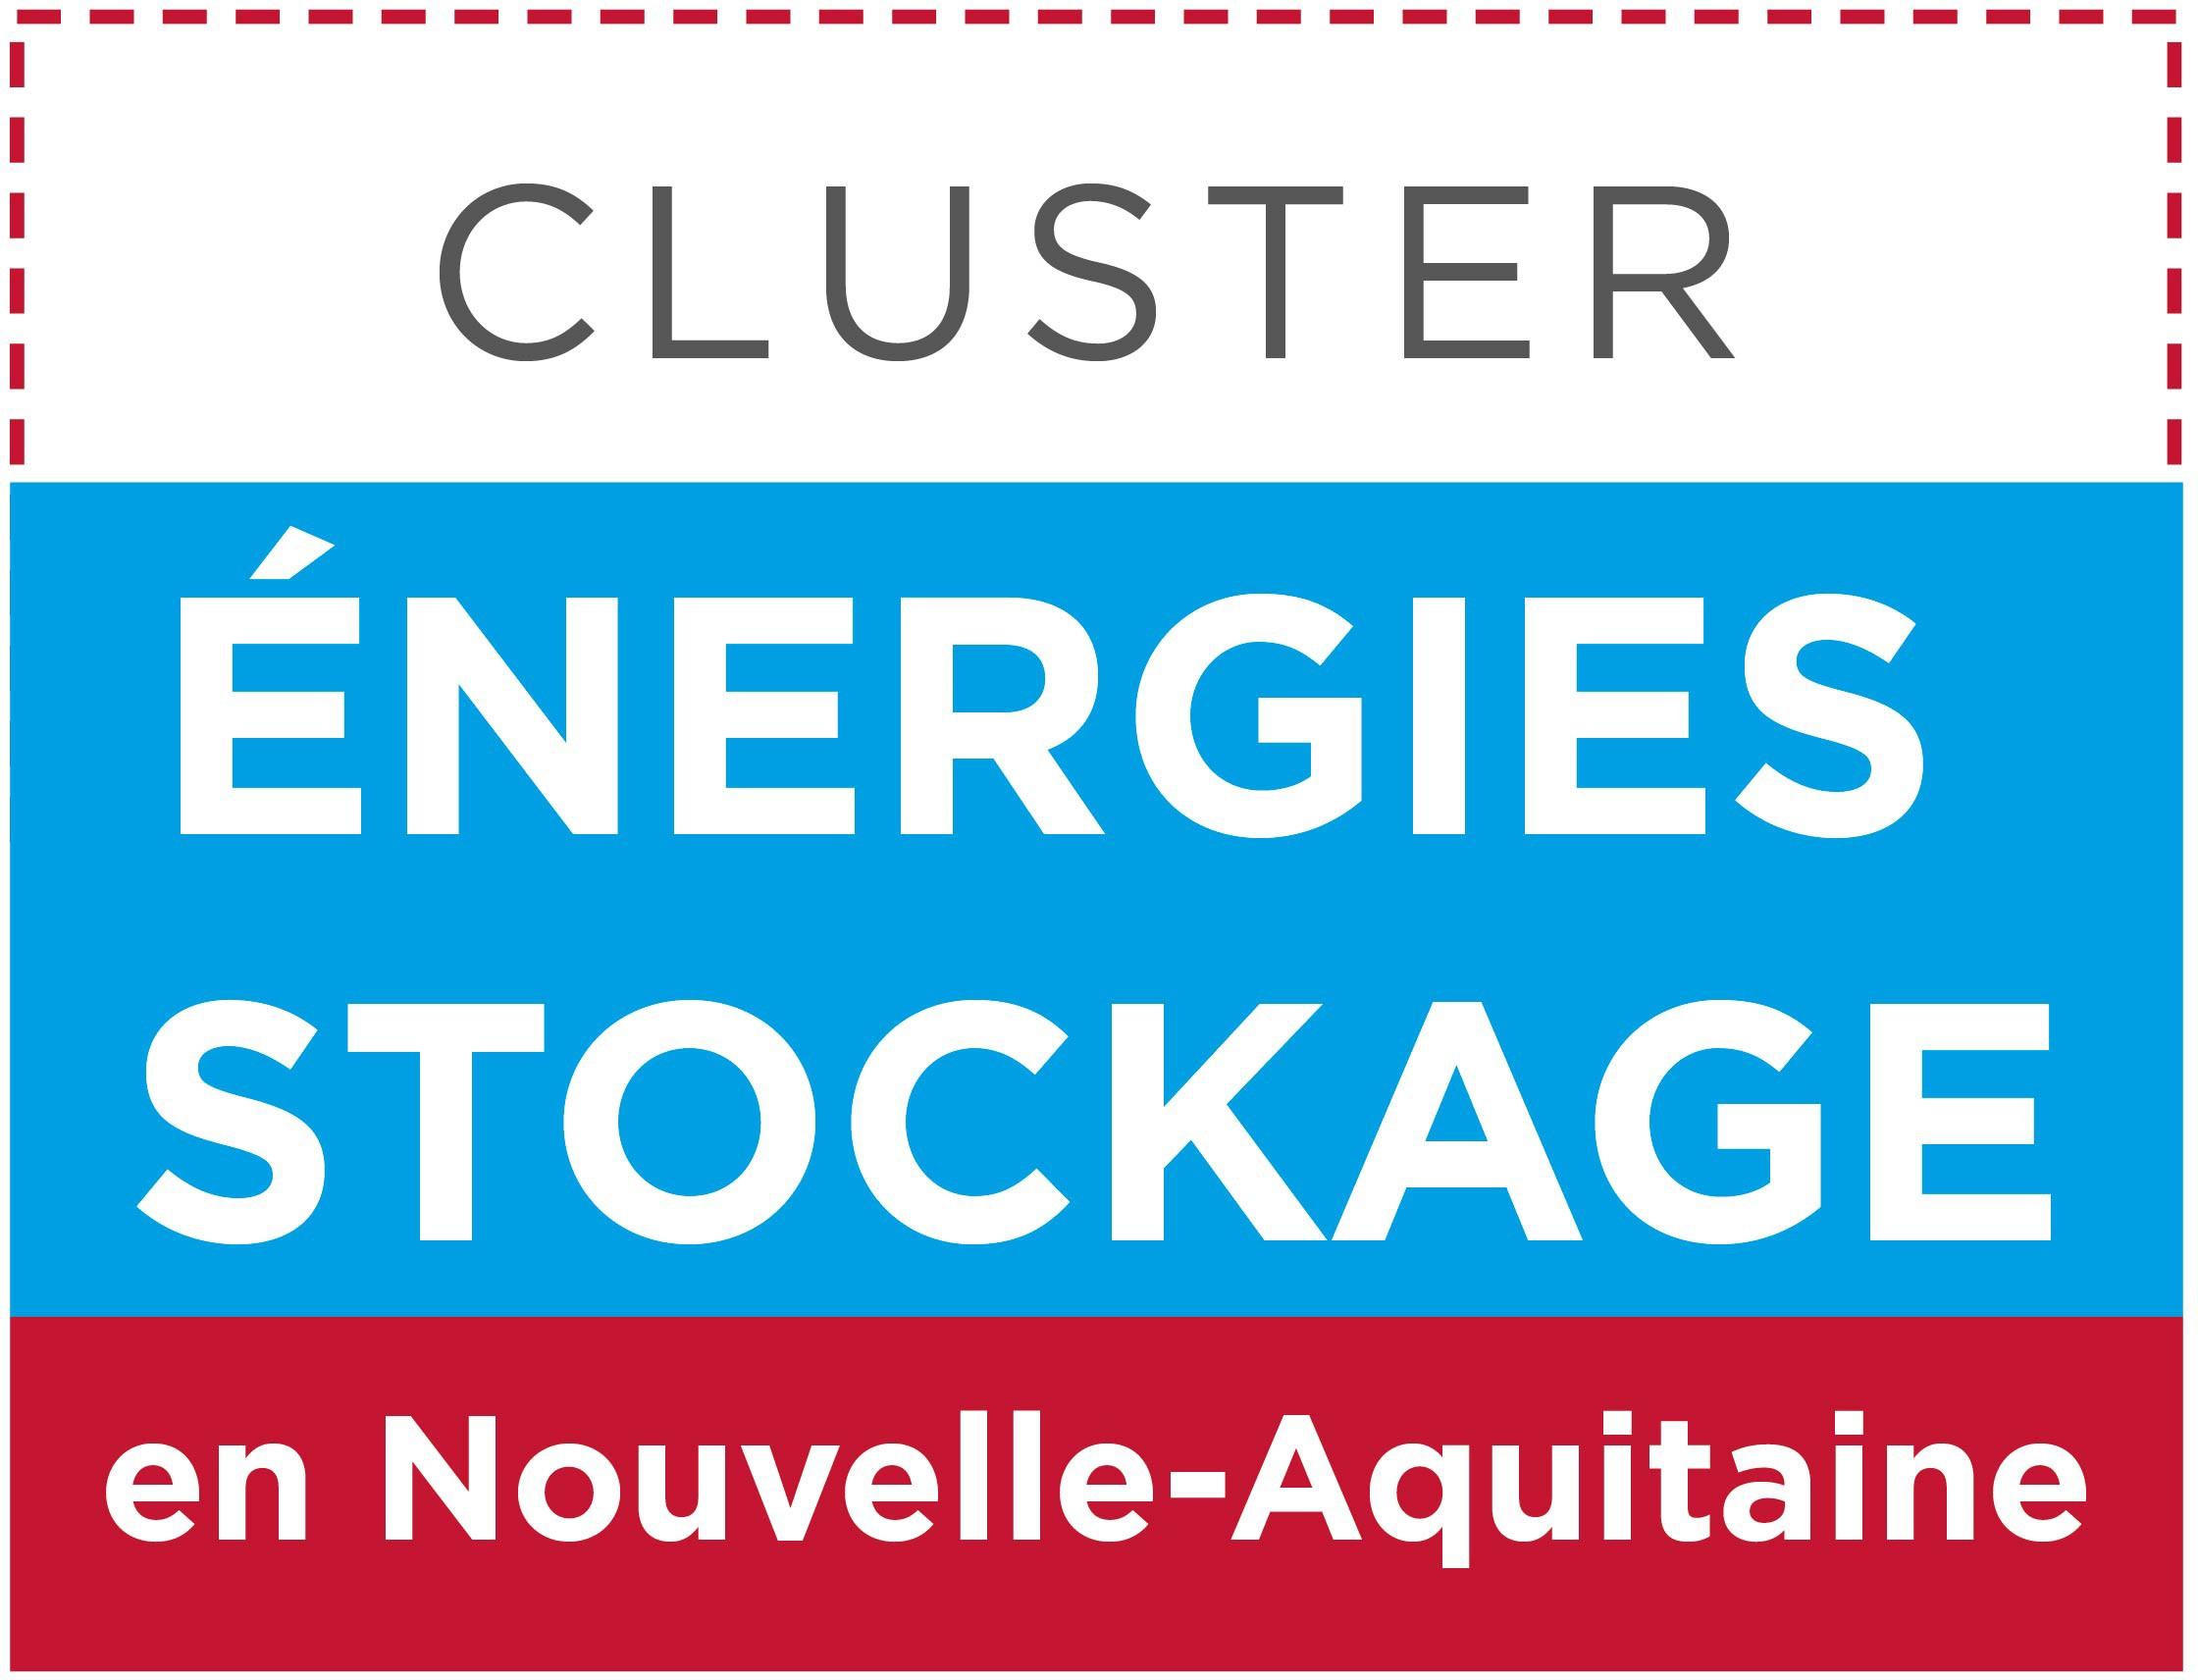 Cluster energie stockage